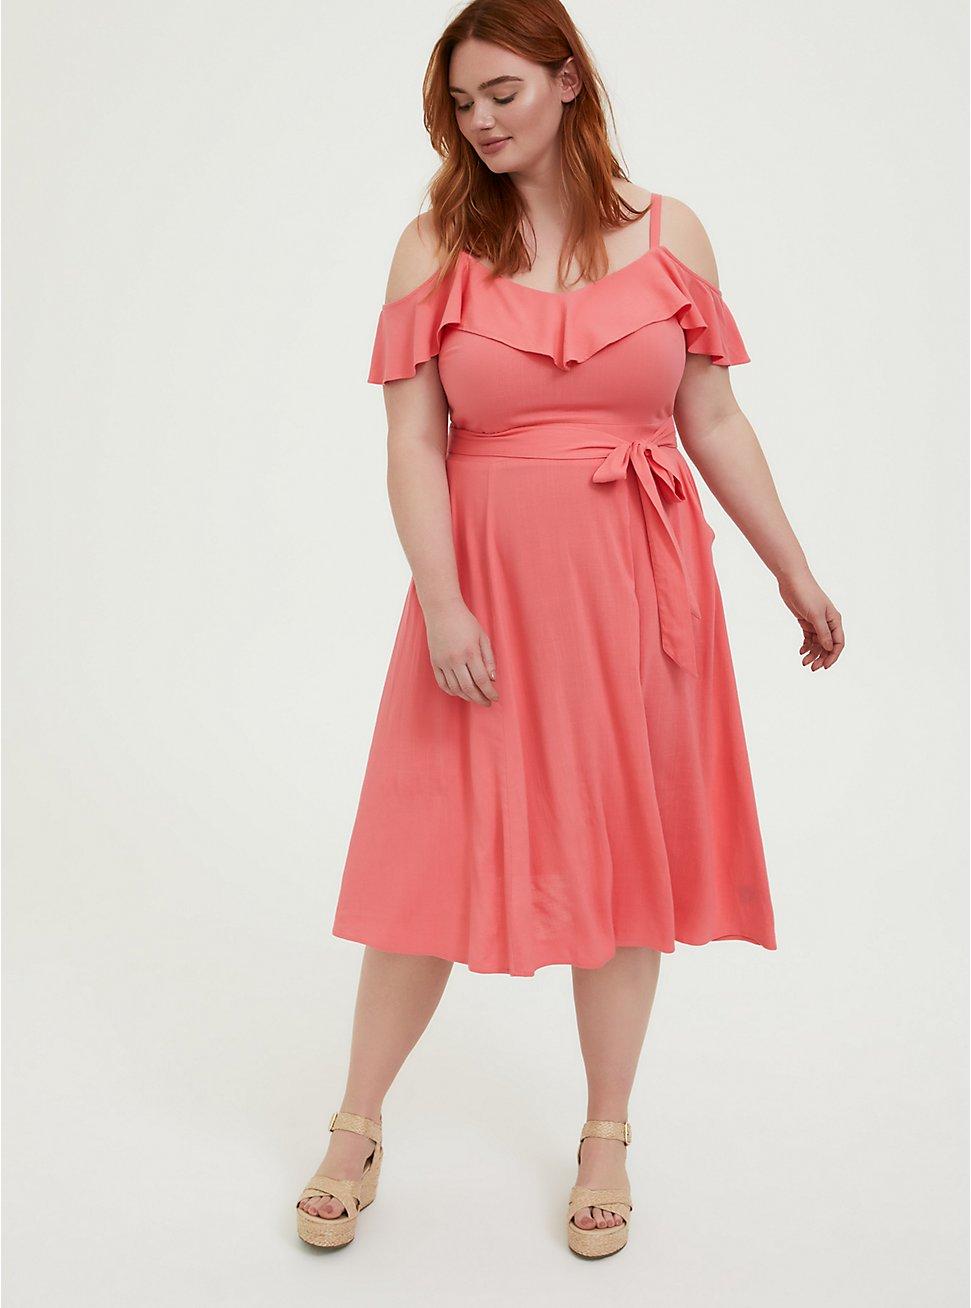 Plus Size Coral Textured Cold Shoulder Self Tie Midi Dress, WILD ORANGE, hi-res